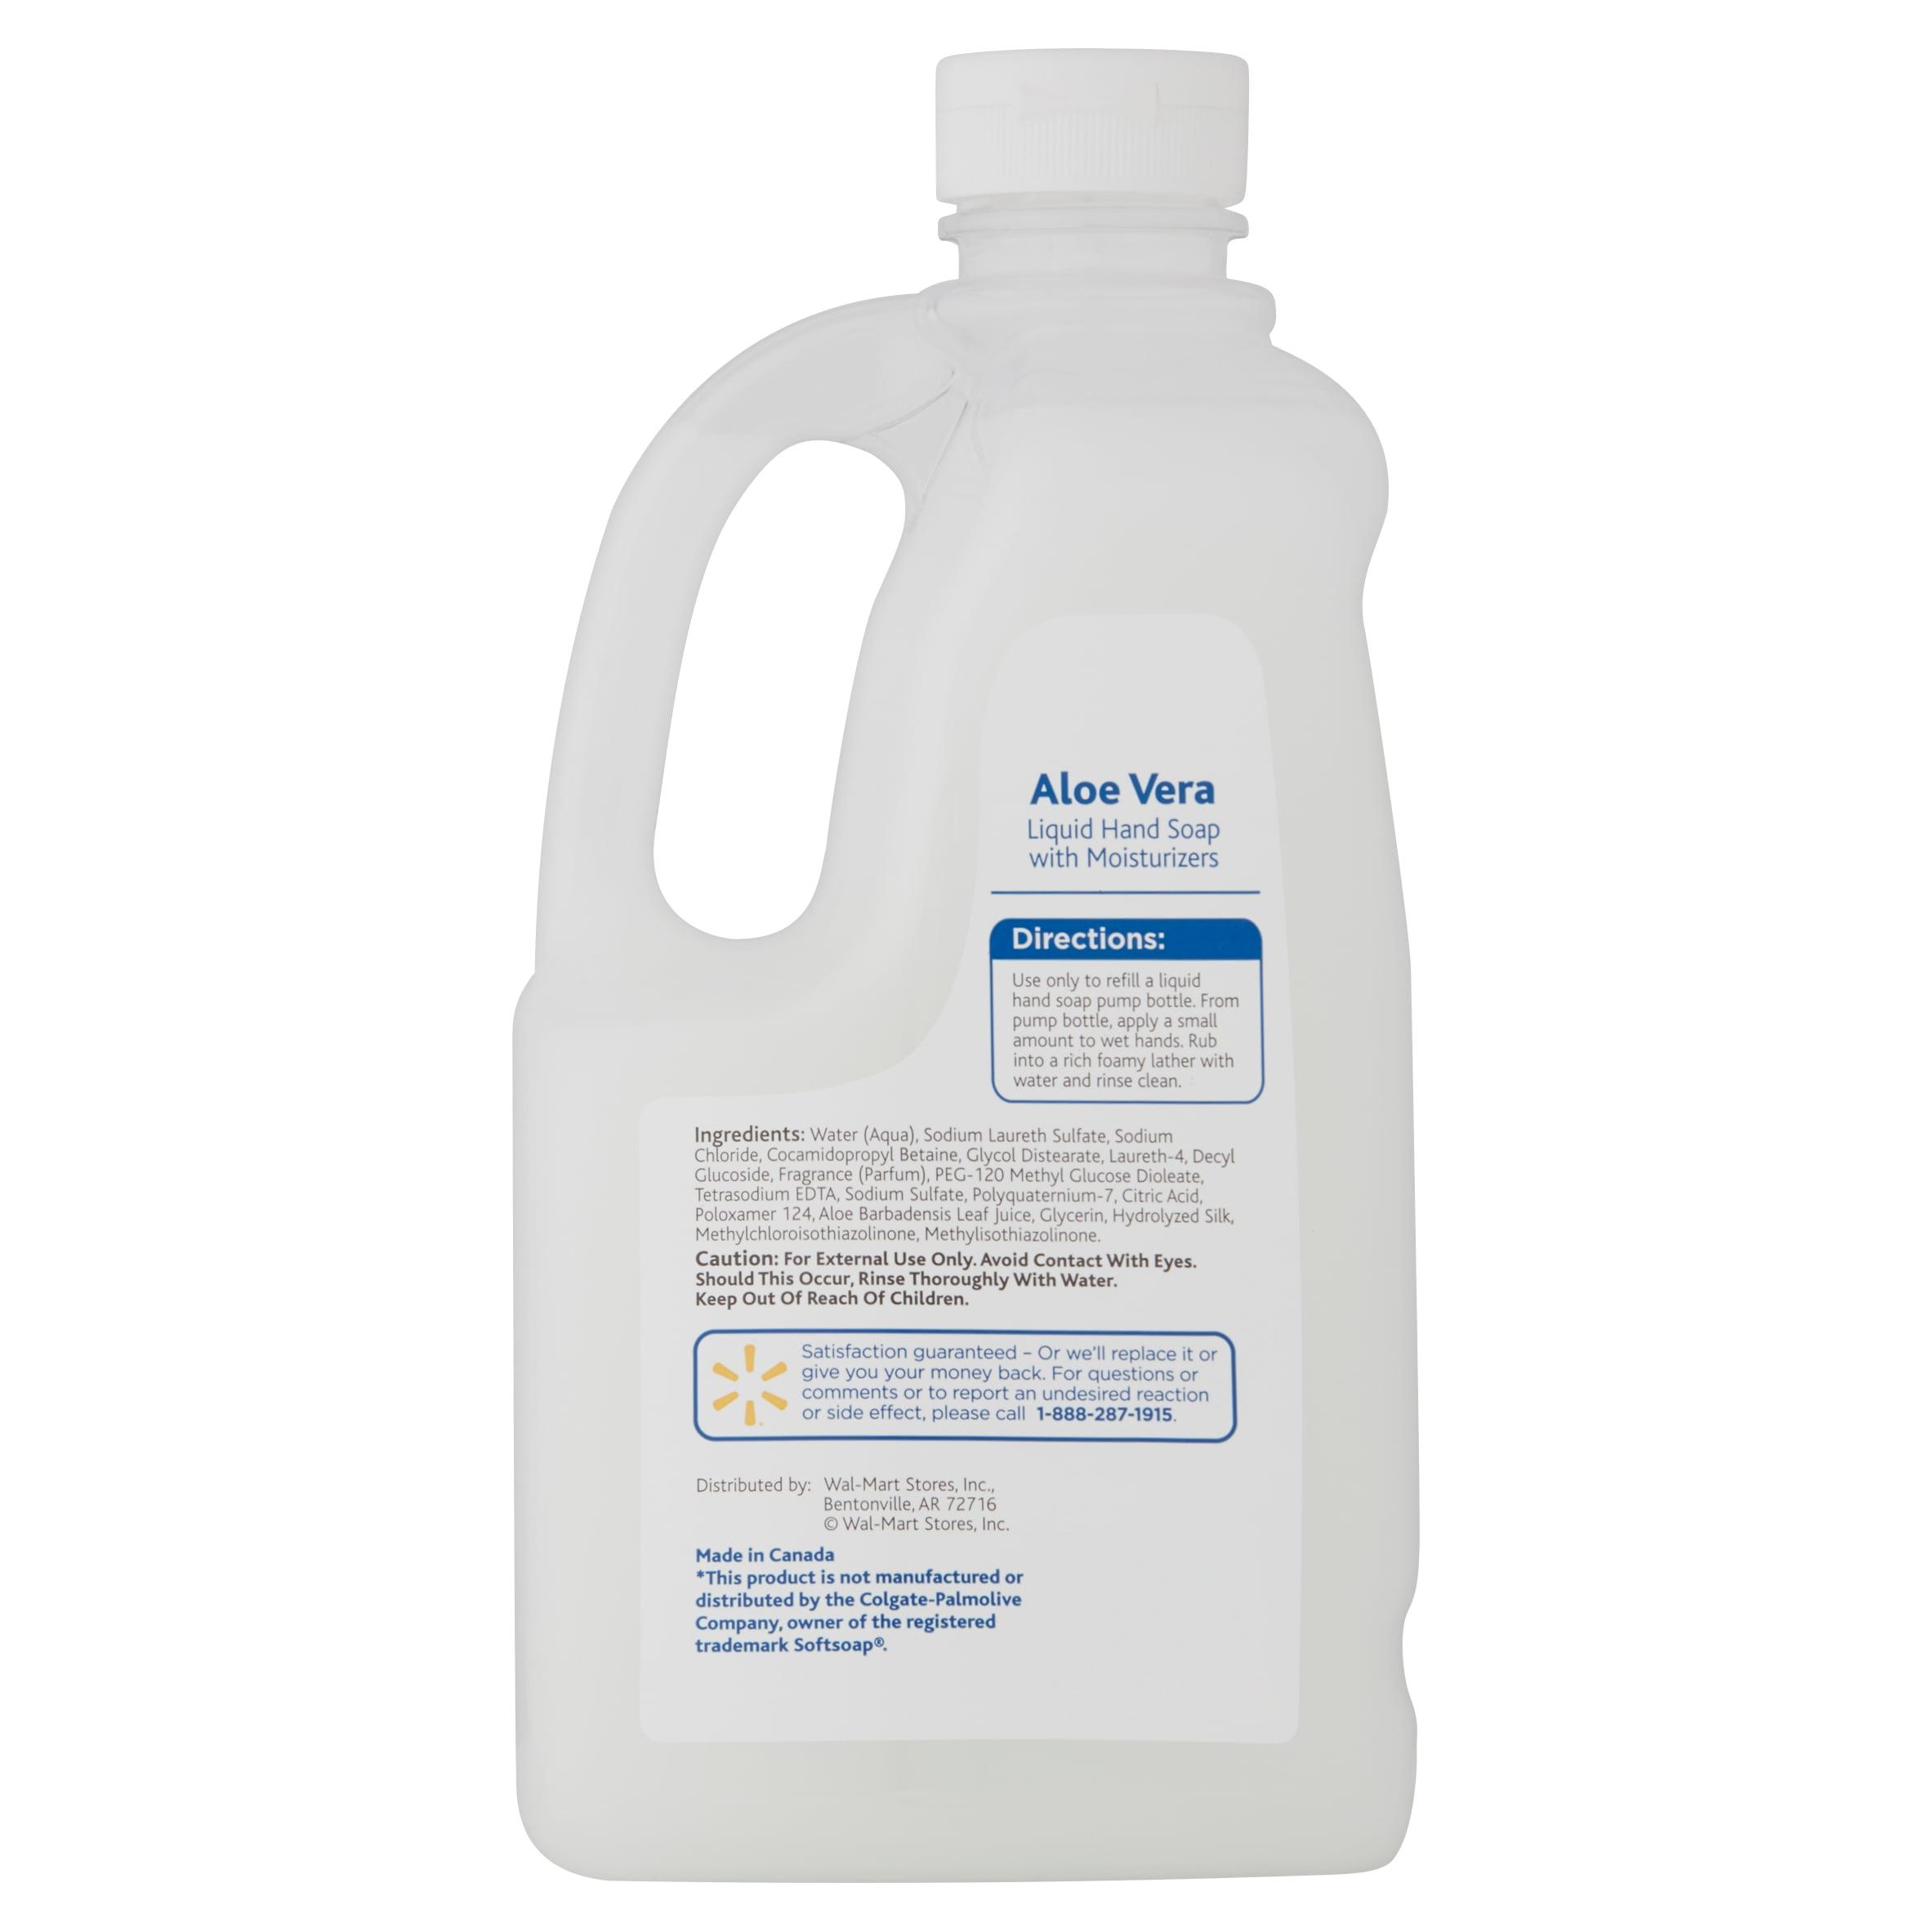 Equate Aloe Vera Liquid Hand Soap with Moisturizers, 56 fl oz